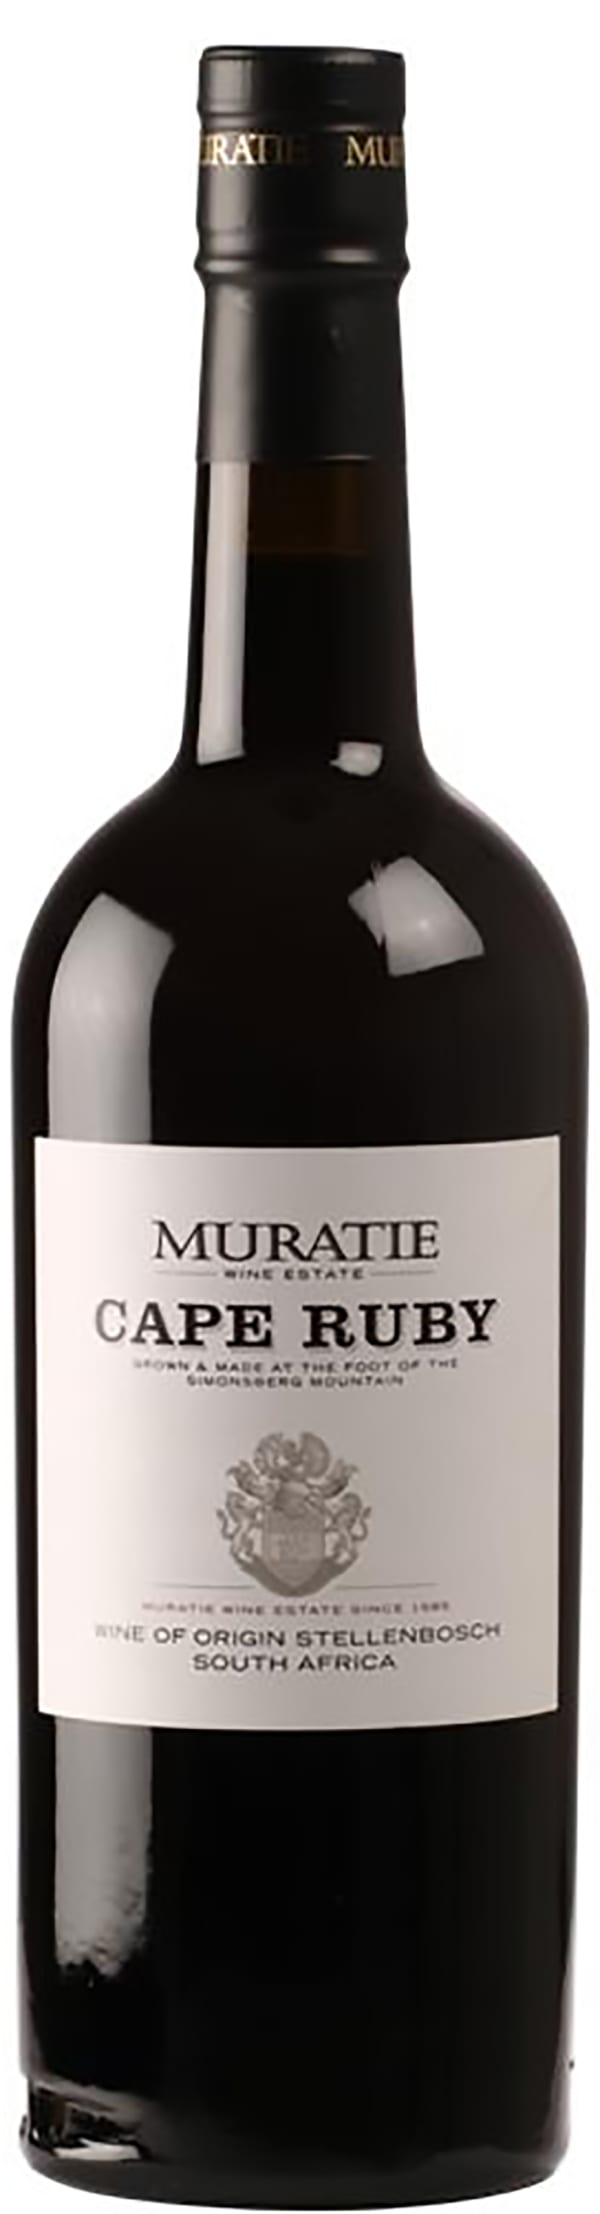 Muratie Cape Ruby